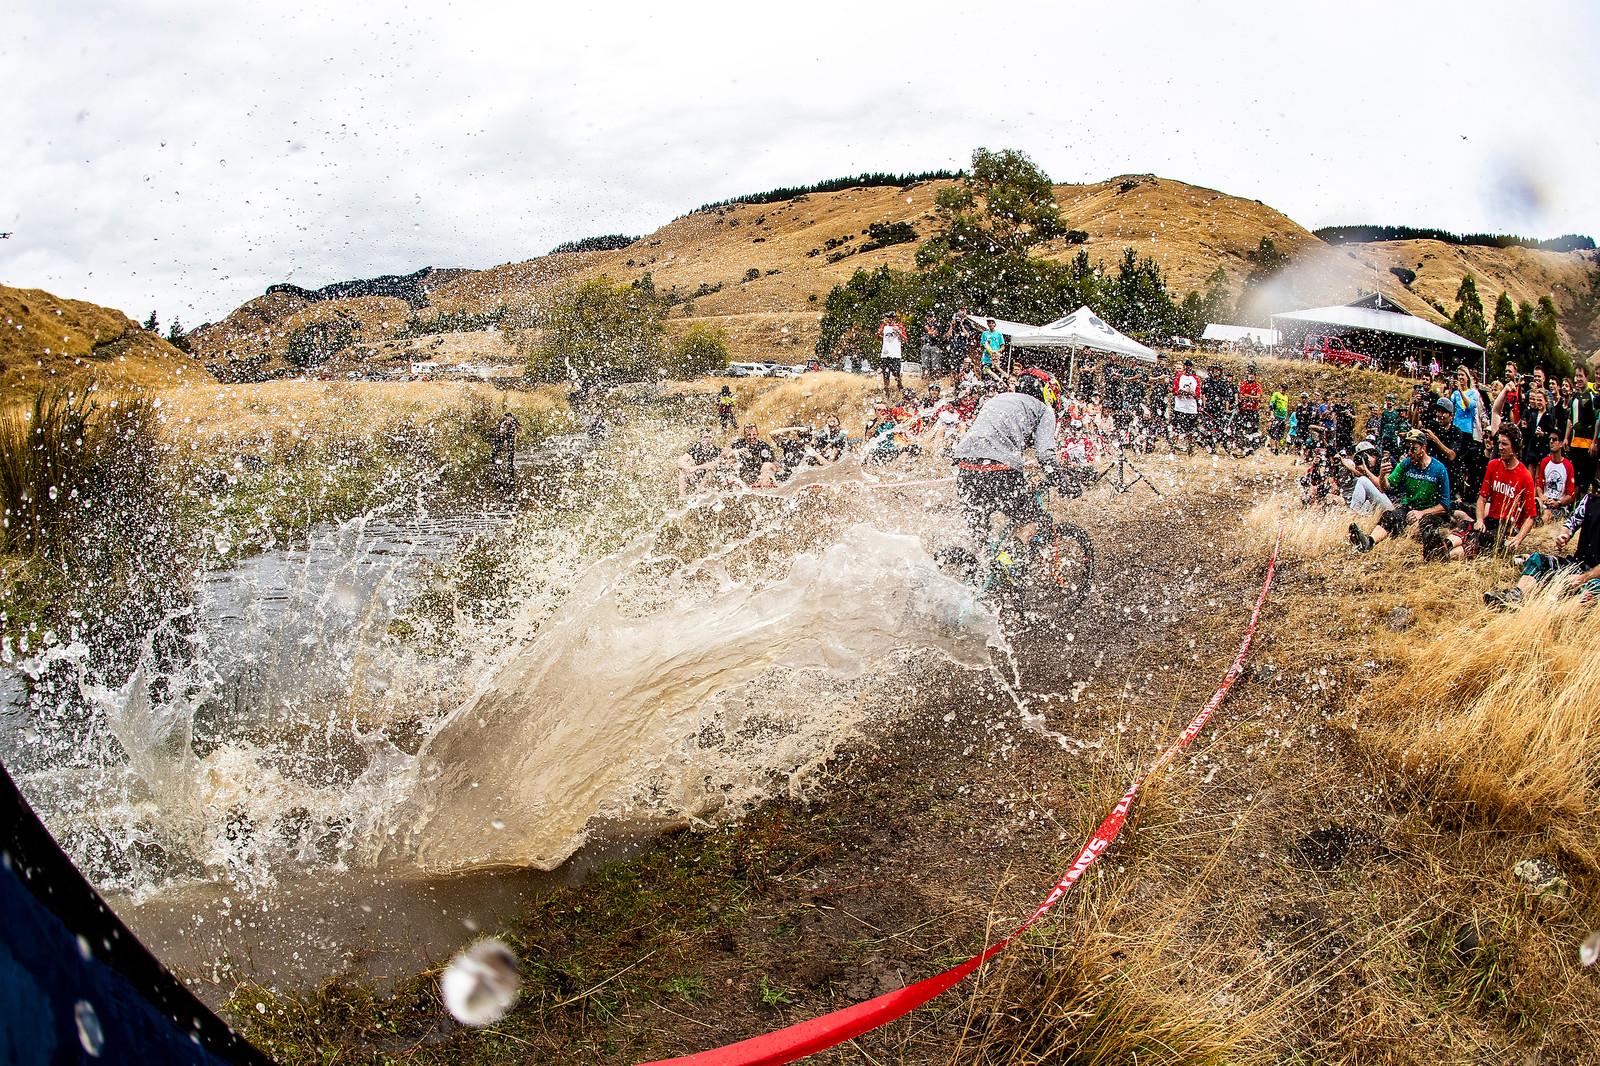 NZEnduro19  m1 9757 - 2019 NZ Enduro Day 3 Photo Gallery - Mountain Biking Pictures - Vital MTB